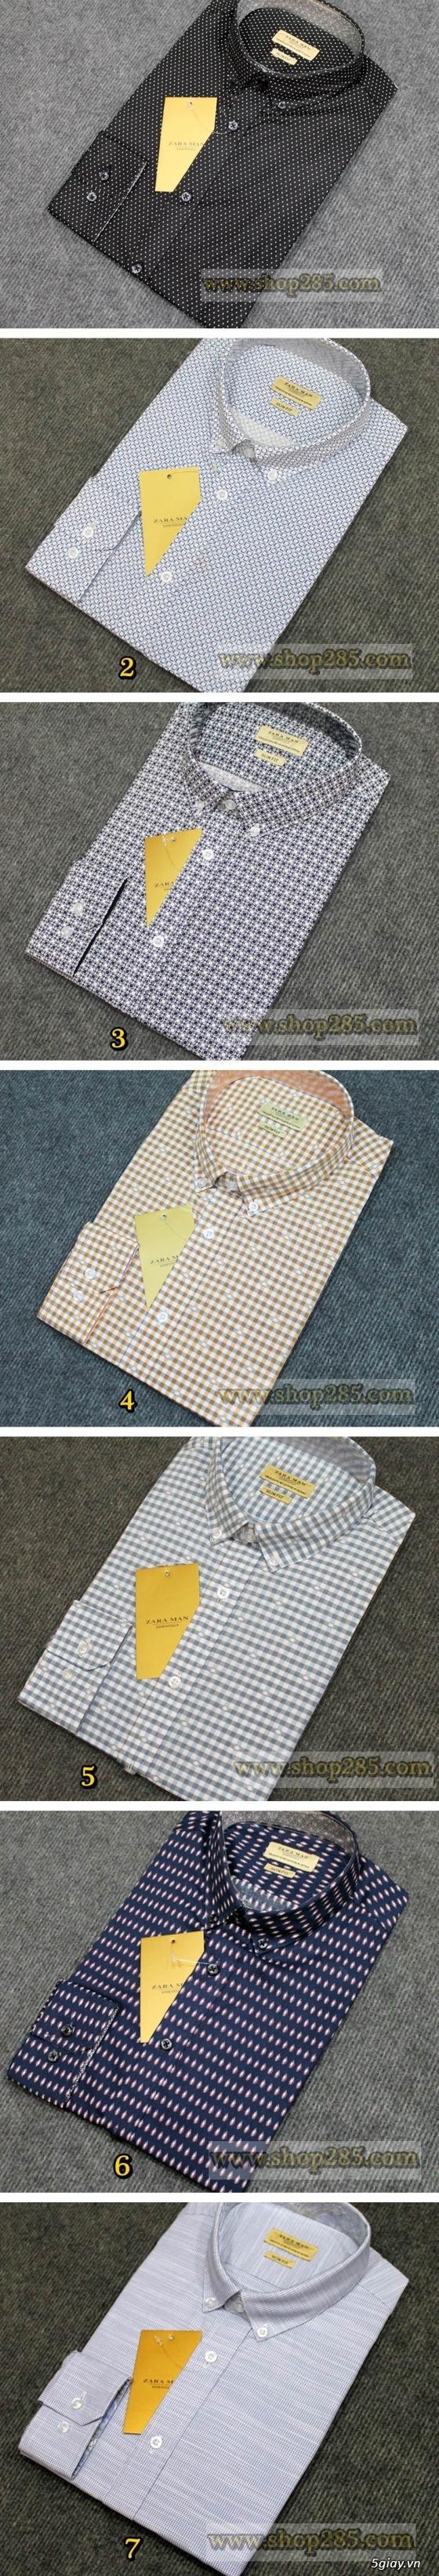 Áo thun Hollister VNXK,áo thun SuperDry VNXK ,áo A&F VNXK ,áo thun cổ tim thun láng - 12